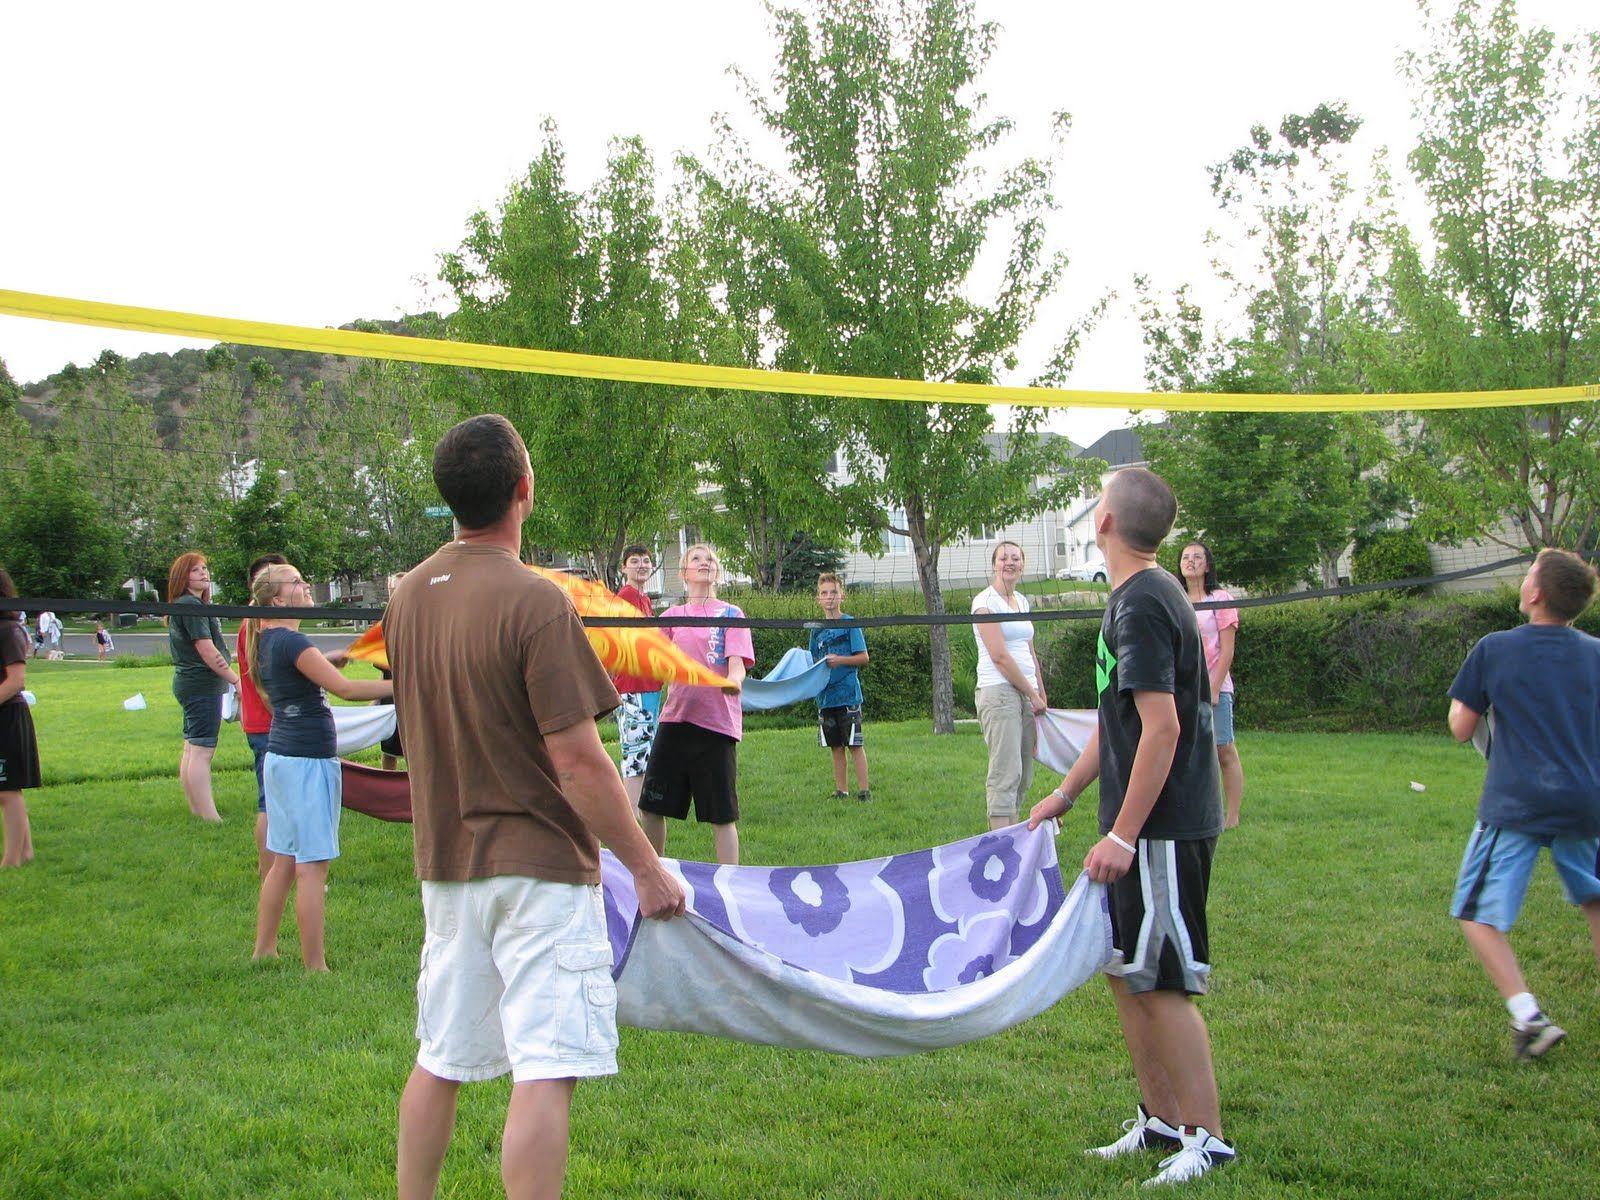 Backyard Water Balloon Volleyball Fun Summer Game Games For Teens Backyard Camping Parties Backyard Campout Party